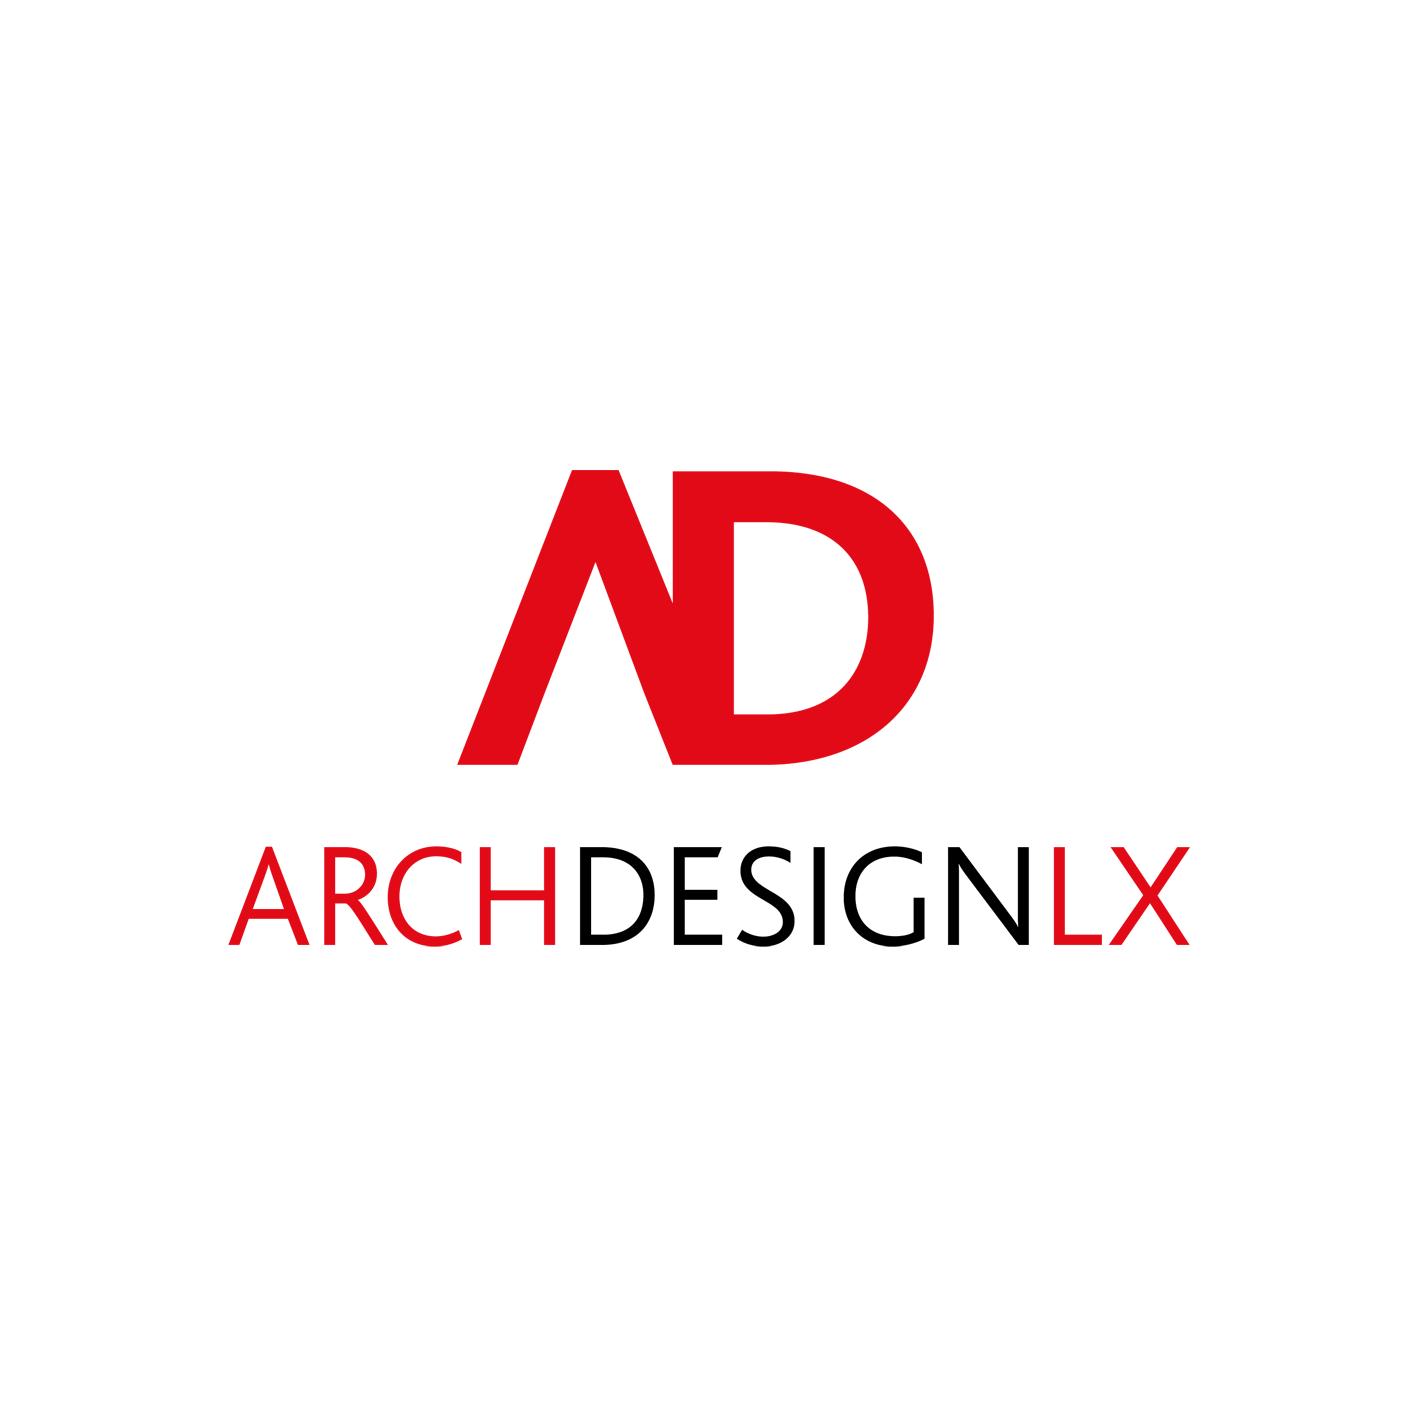 ARCHDESIGN LX